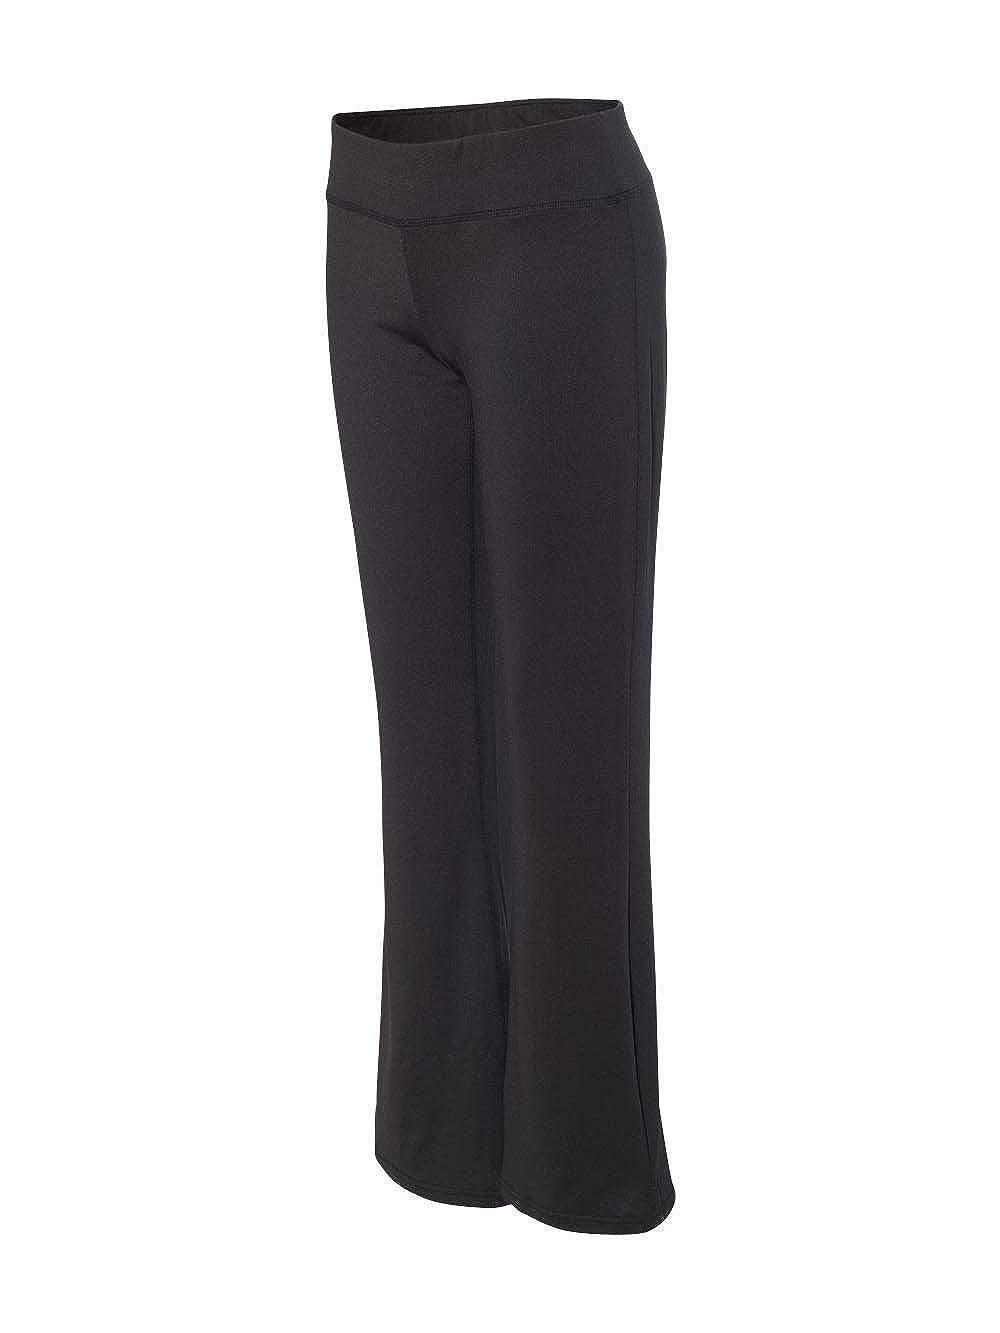 6e8ff980f057af Amazon.com: Badger Women's Yoga Travel Pants - 4218: Clothing